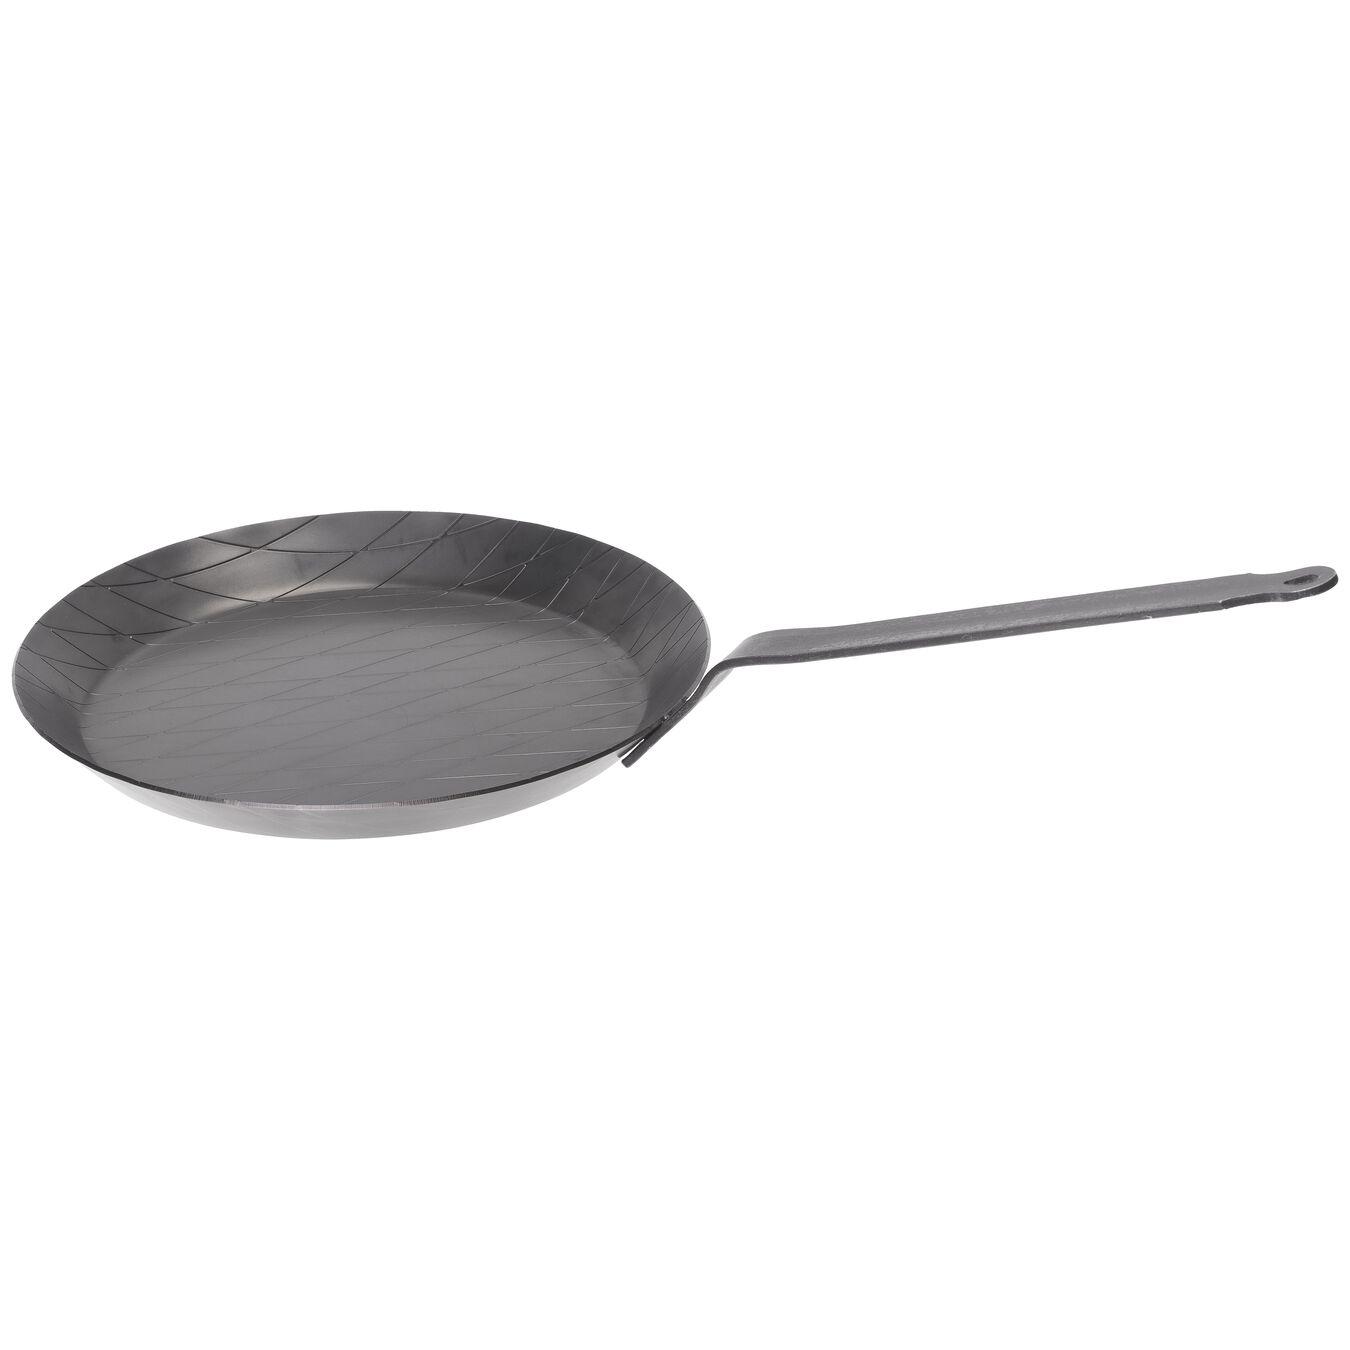 28 cm / 11 inch Frying pan,,large 1